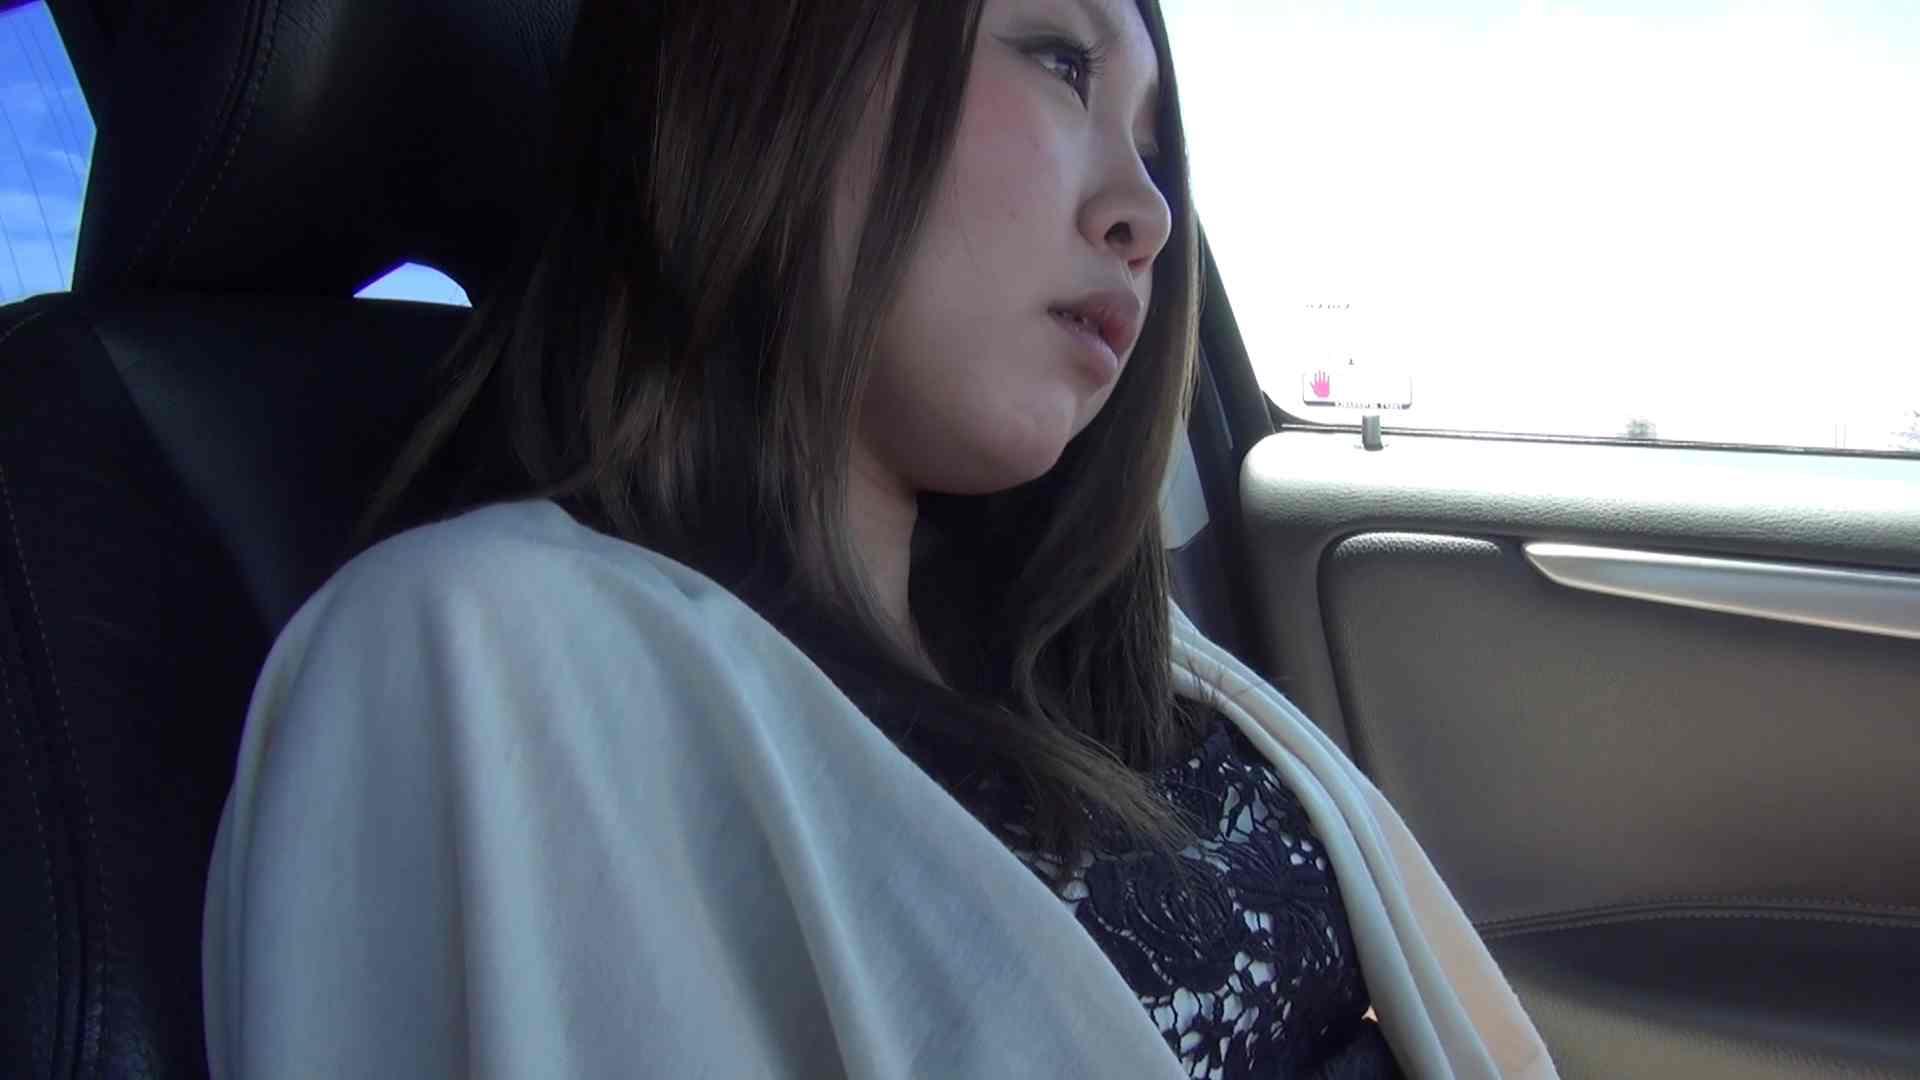 episode6 ドライブ中に・・・妻に強せいオナニー オナニー集 | 寝取り・他人棒  56pic 16